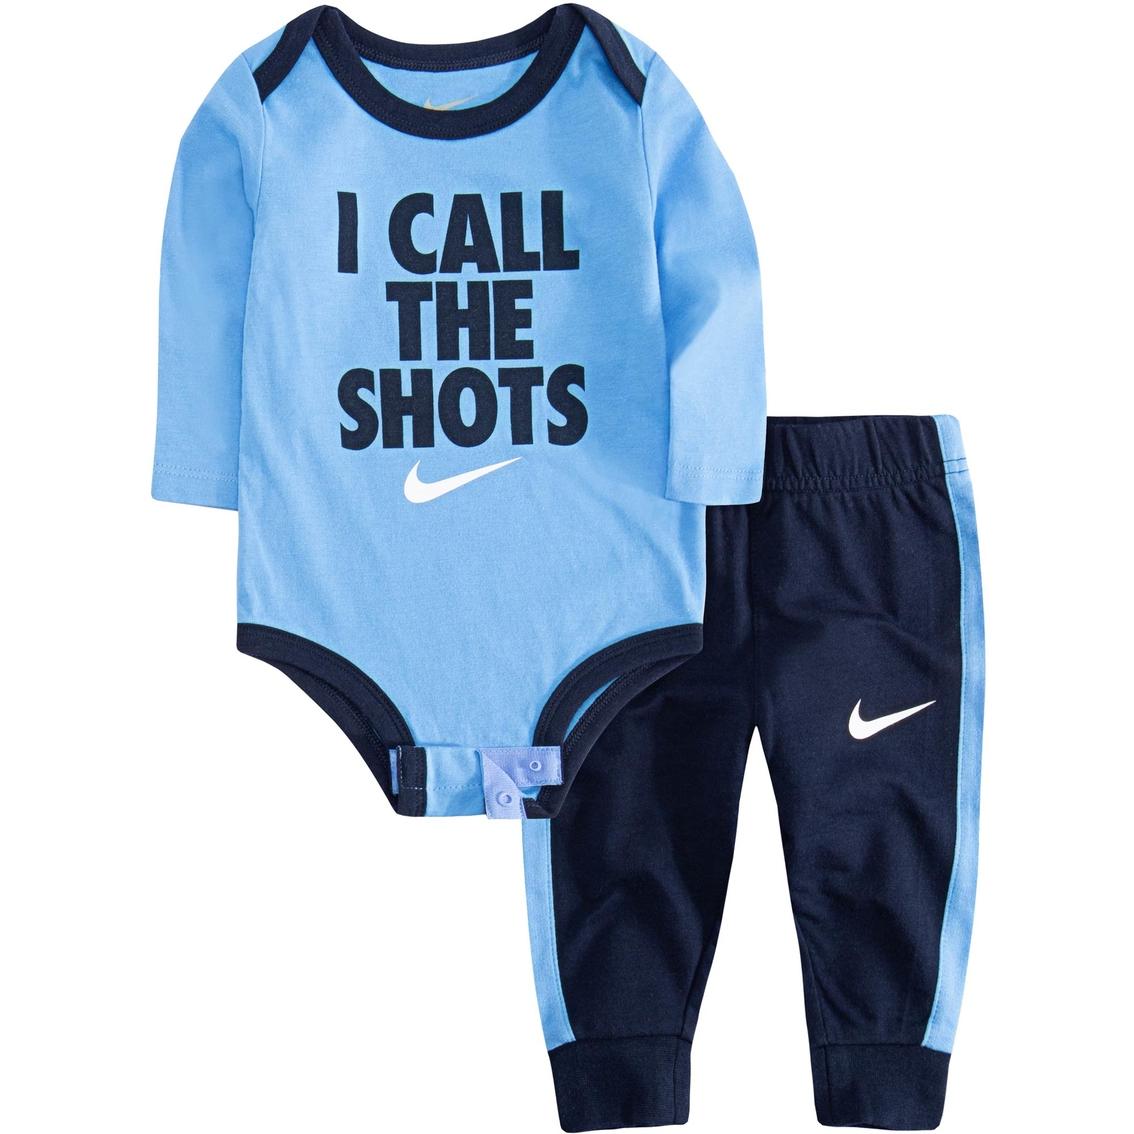 82025d323d Nike Infant Boys I Call The Shots Bodysuit With Pants Set | Baby Boy ...